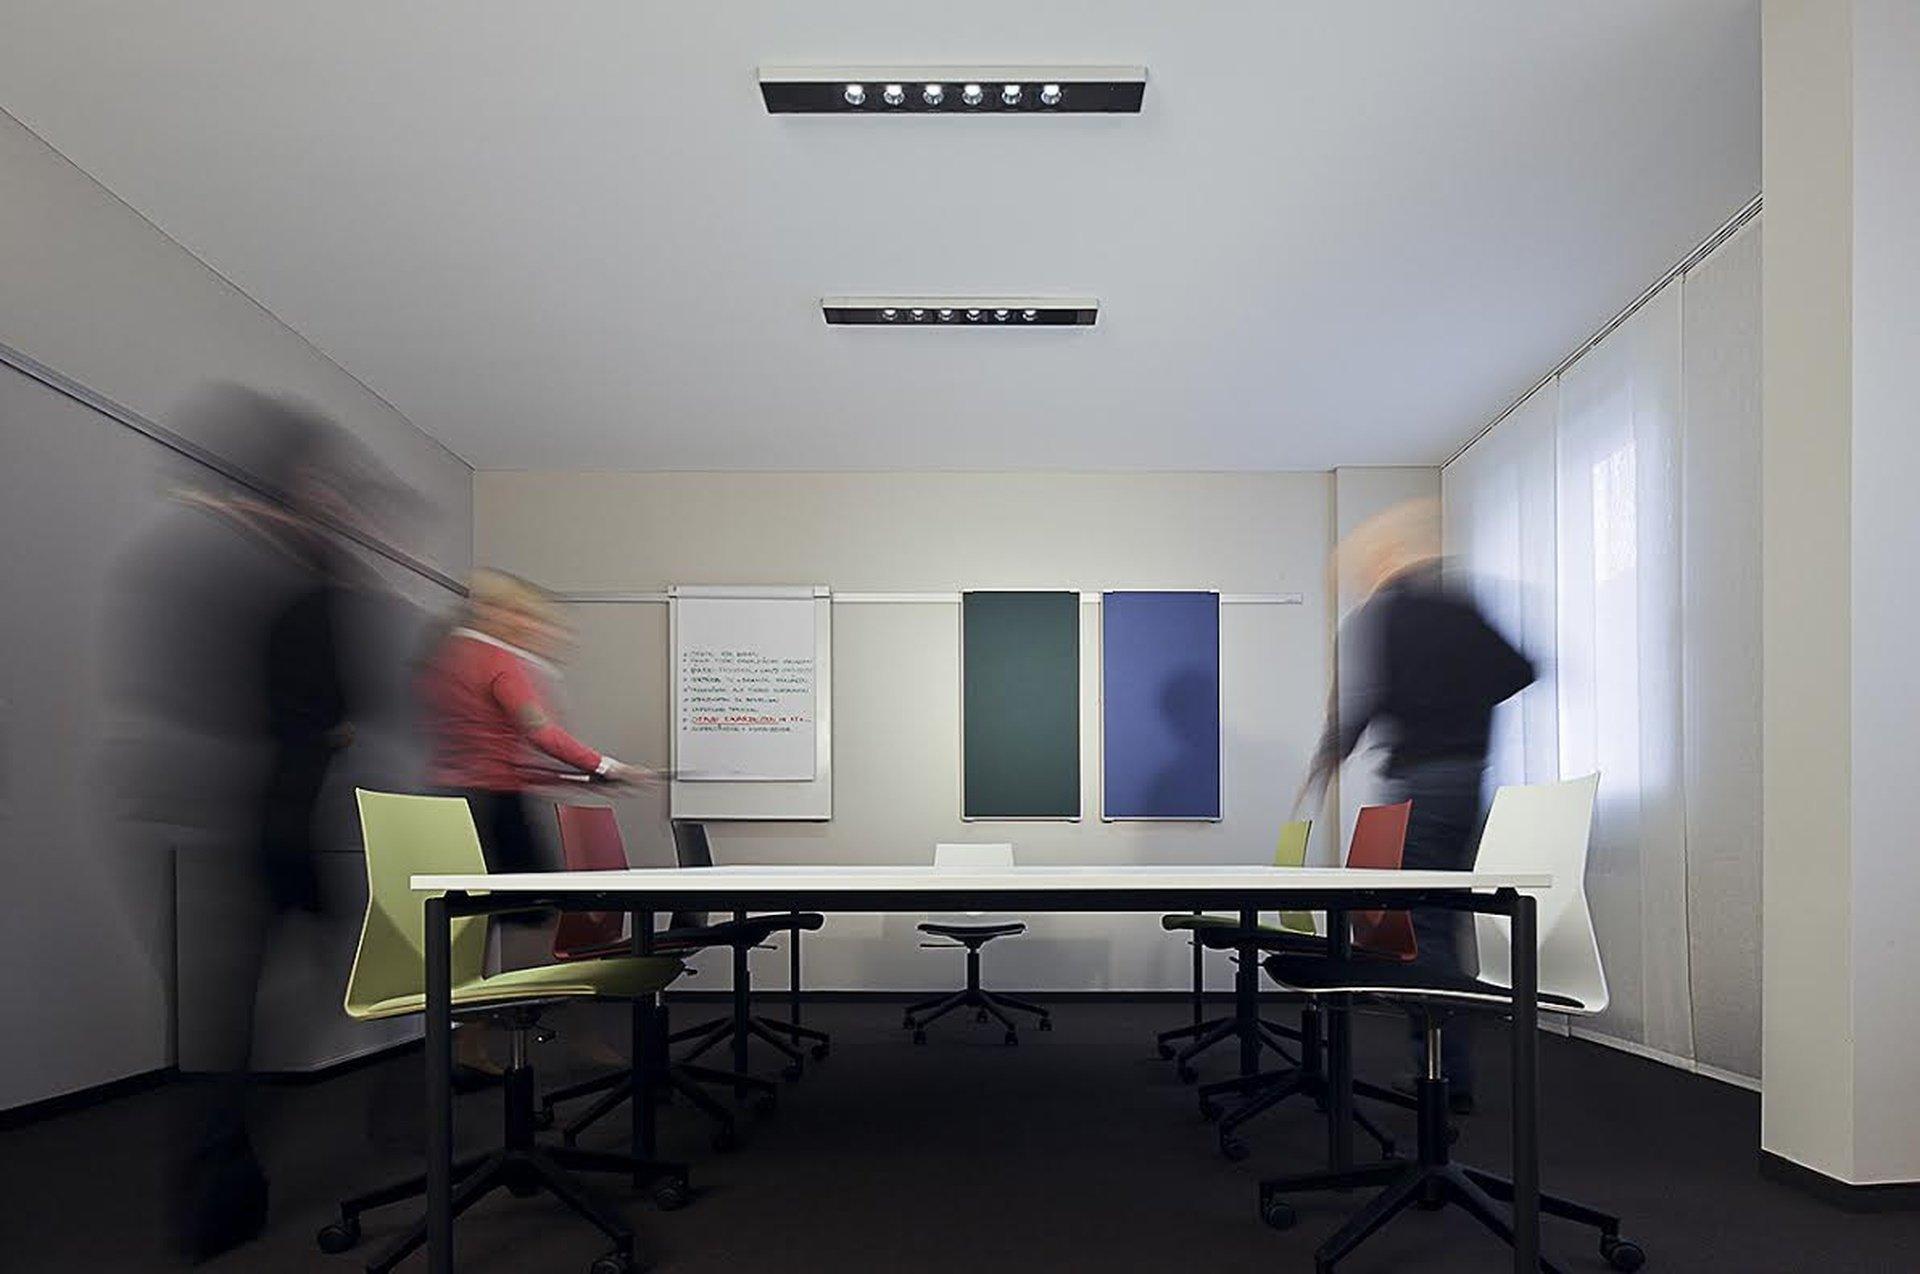 Francfort Train station meeting rooms Salle de réunion MEET/N/WORK - Project Area image 10